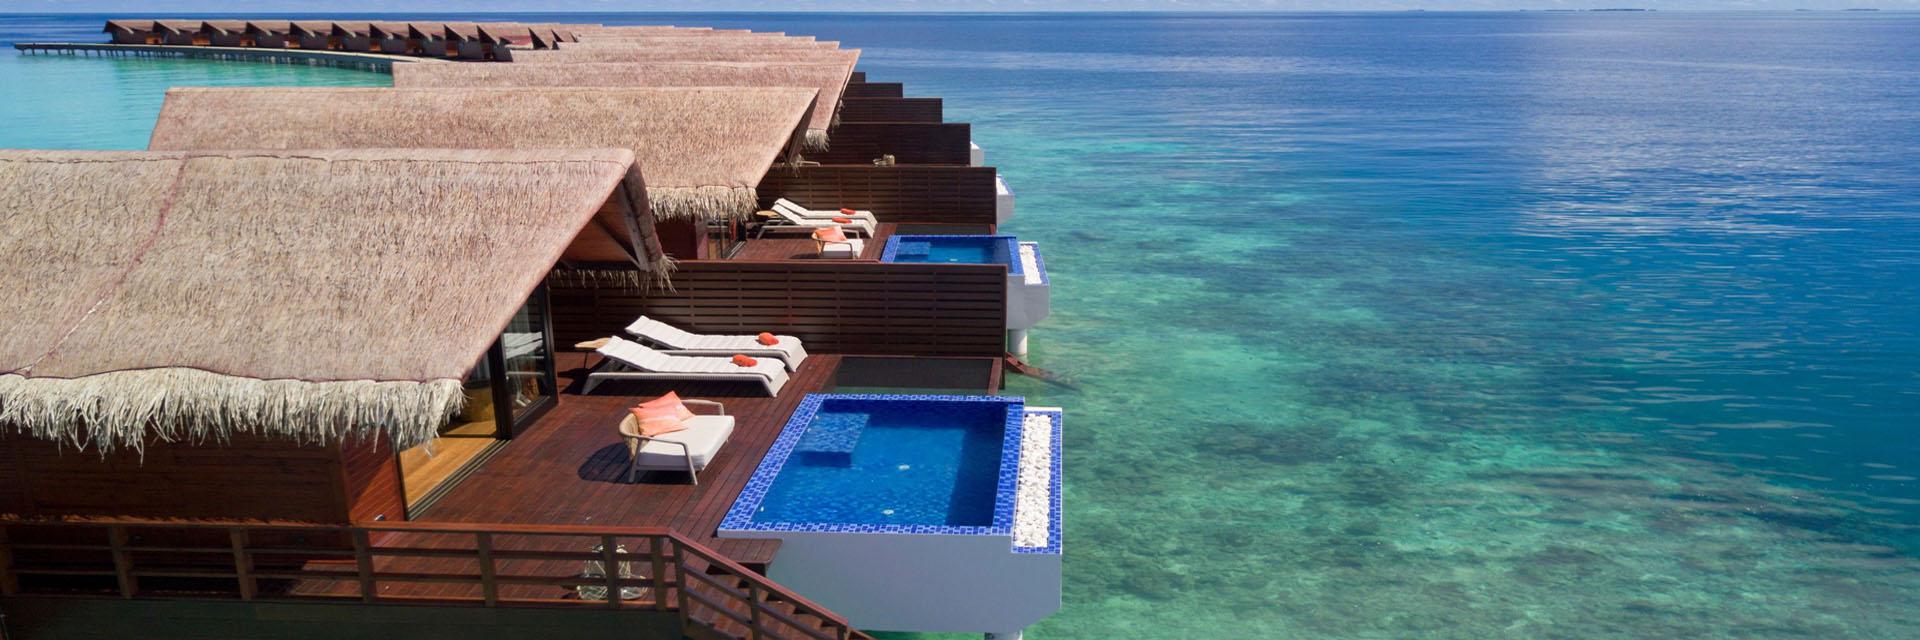 grand-park-kodhipparu-maldives-house-reef-villa